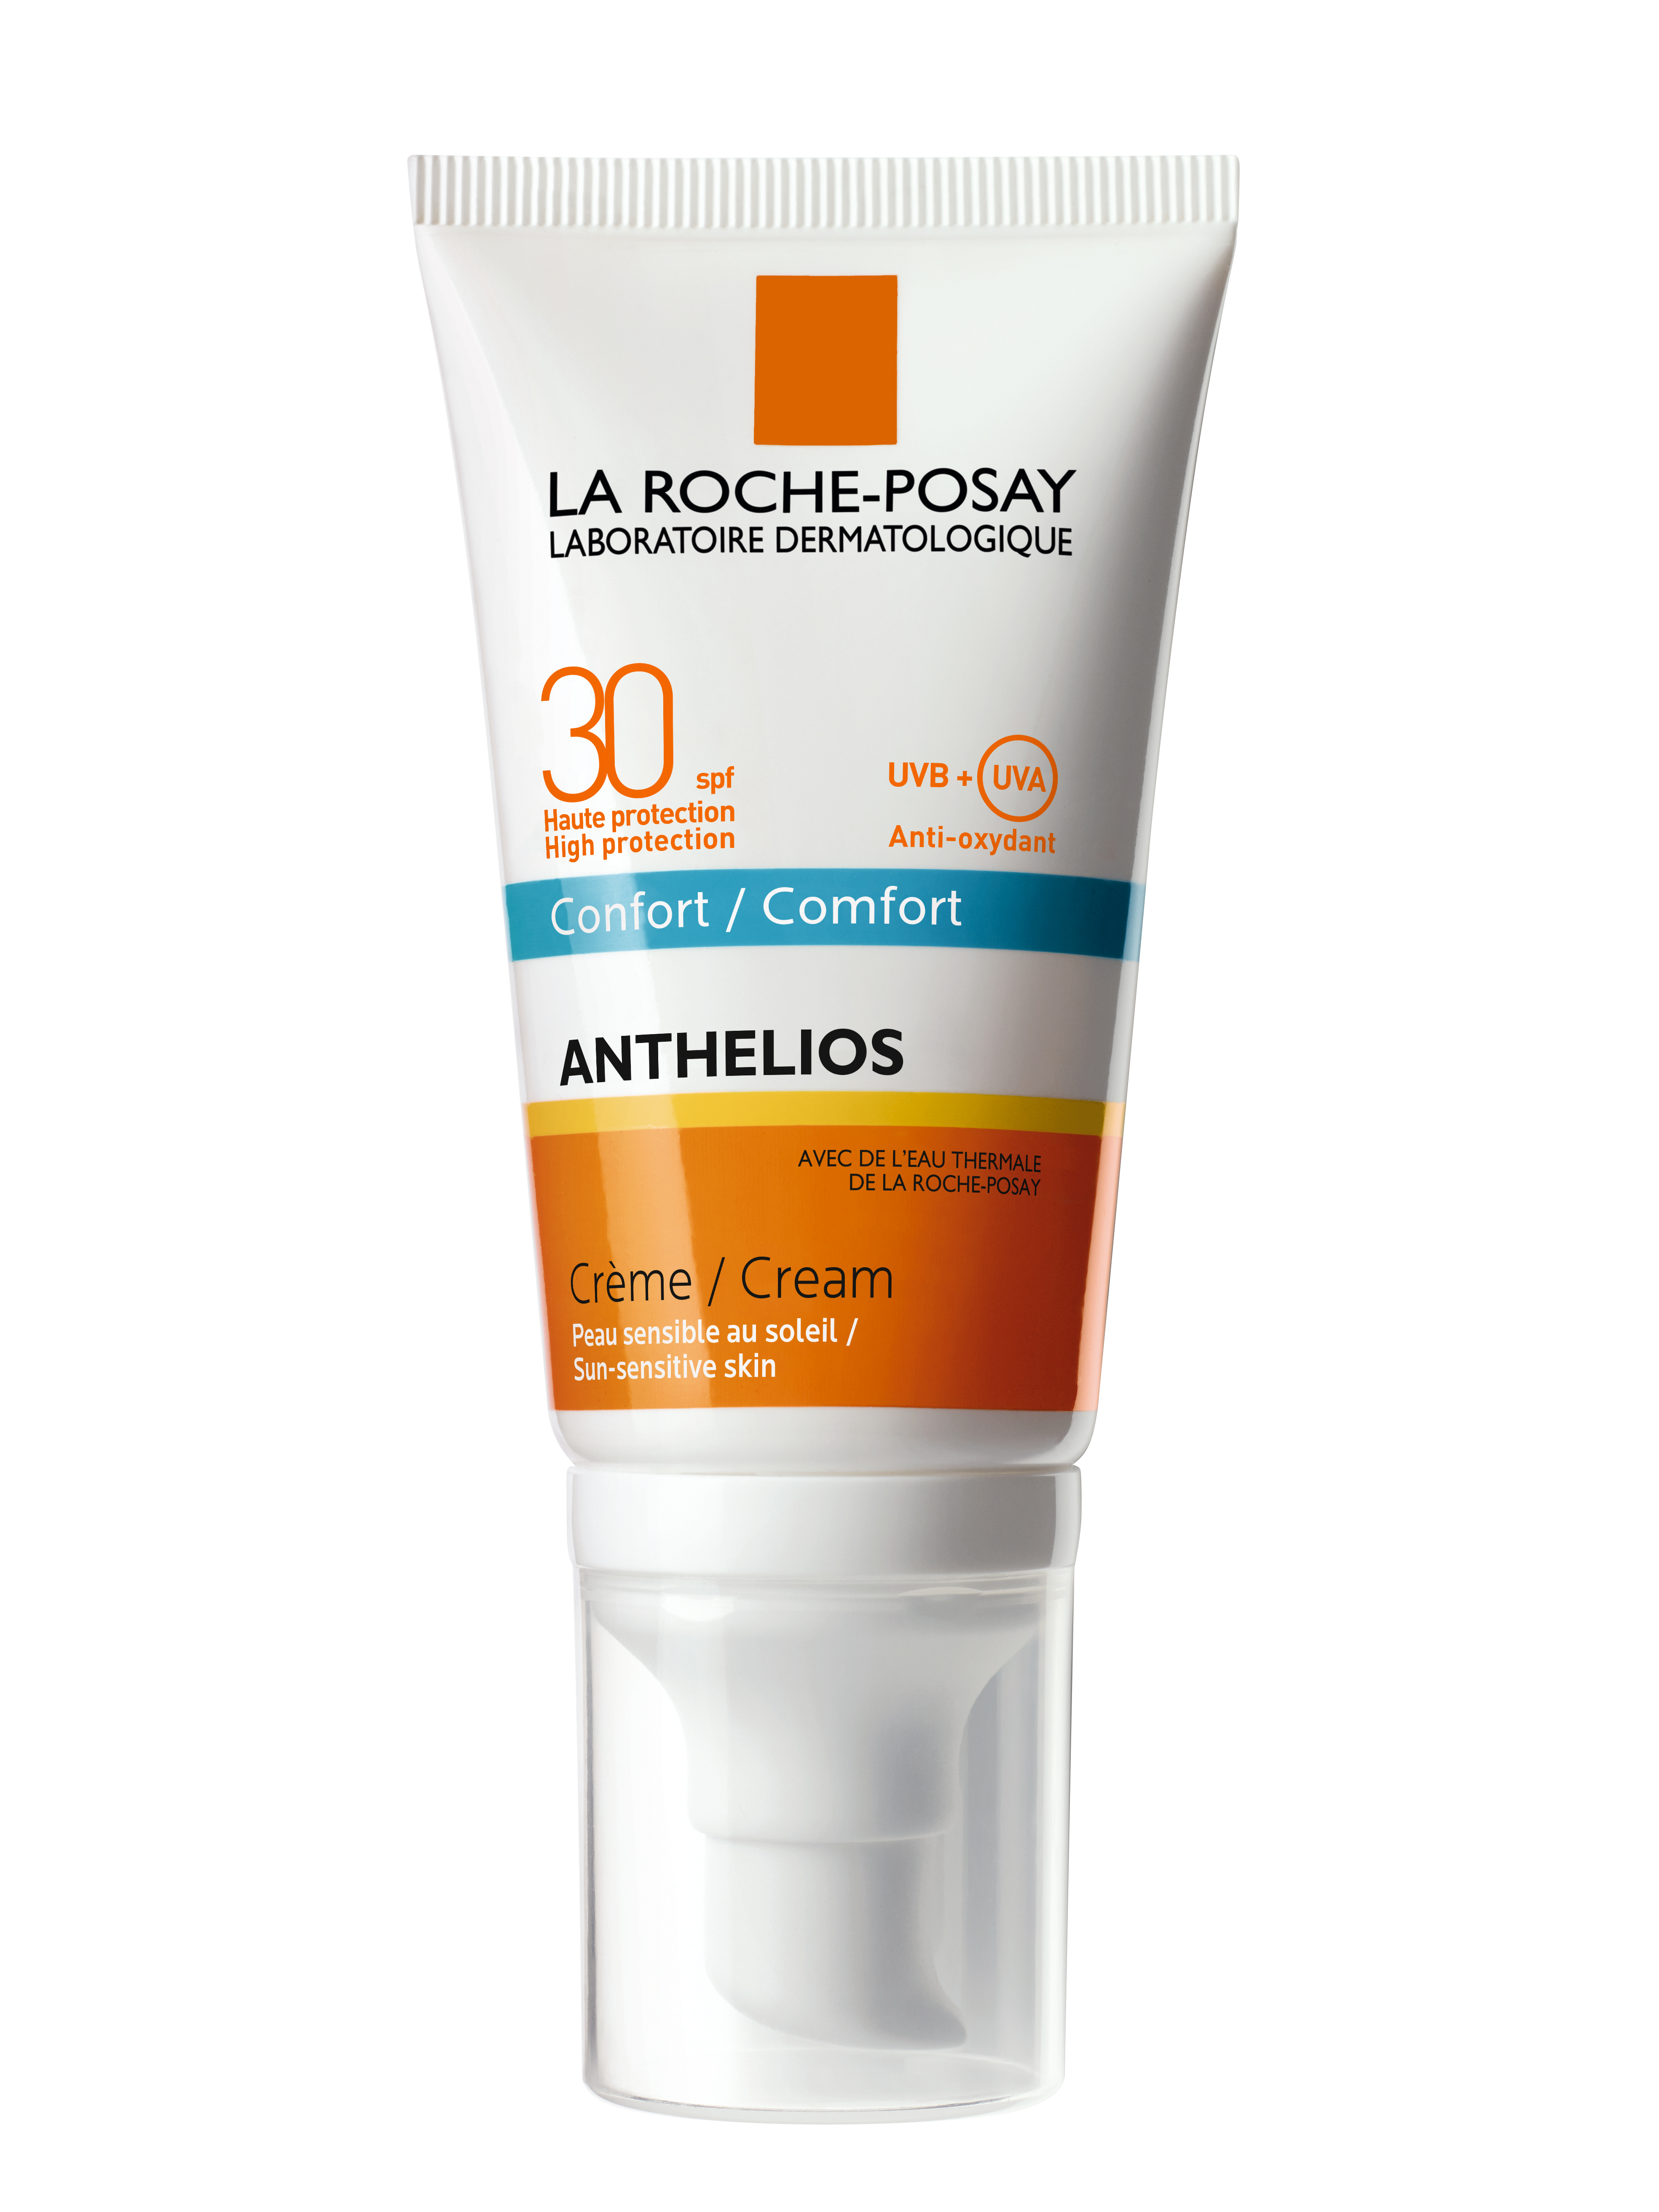 La Roche-Posay Anthelios XL Creme Comfort Spf30 Αντηλιακή Kρέμα Προσώπου για την Ευαίσθητη Επιδερμίδα 50ml